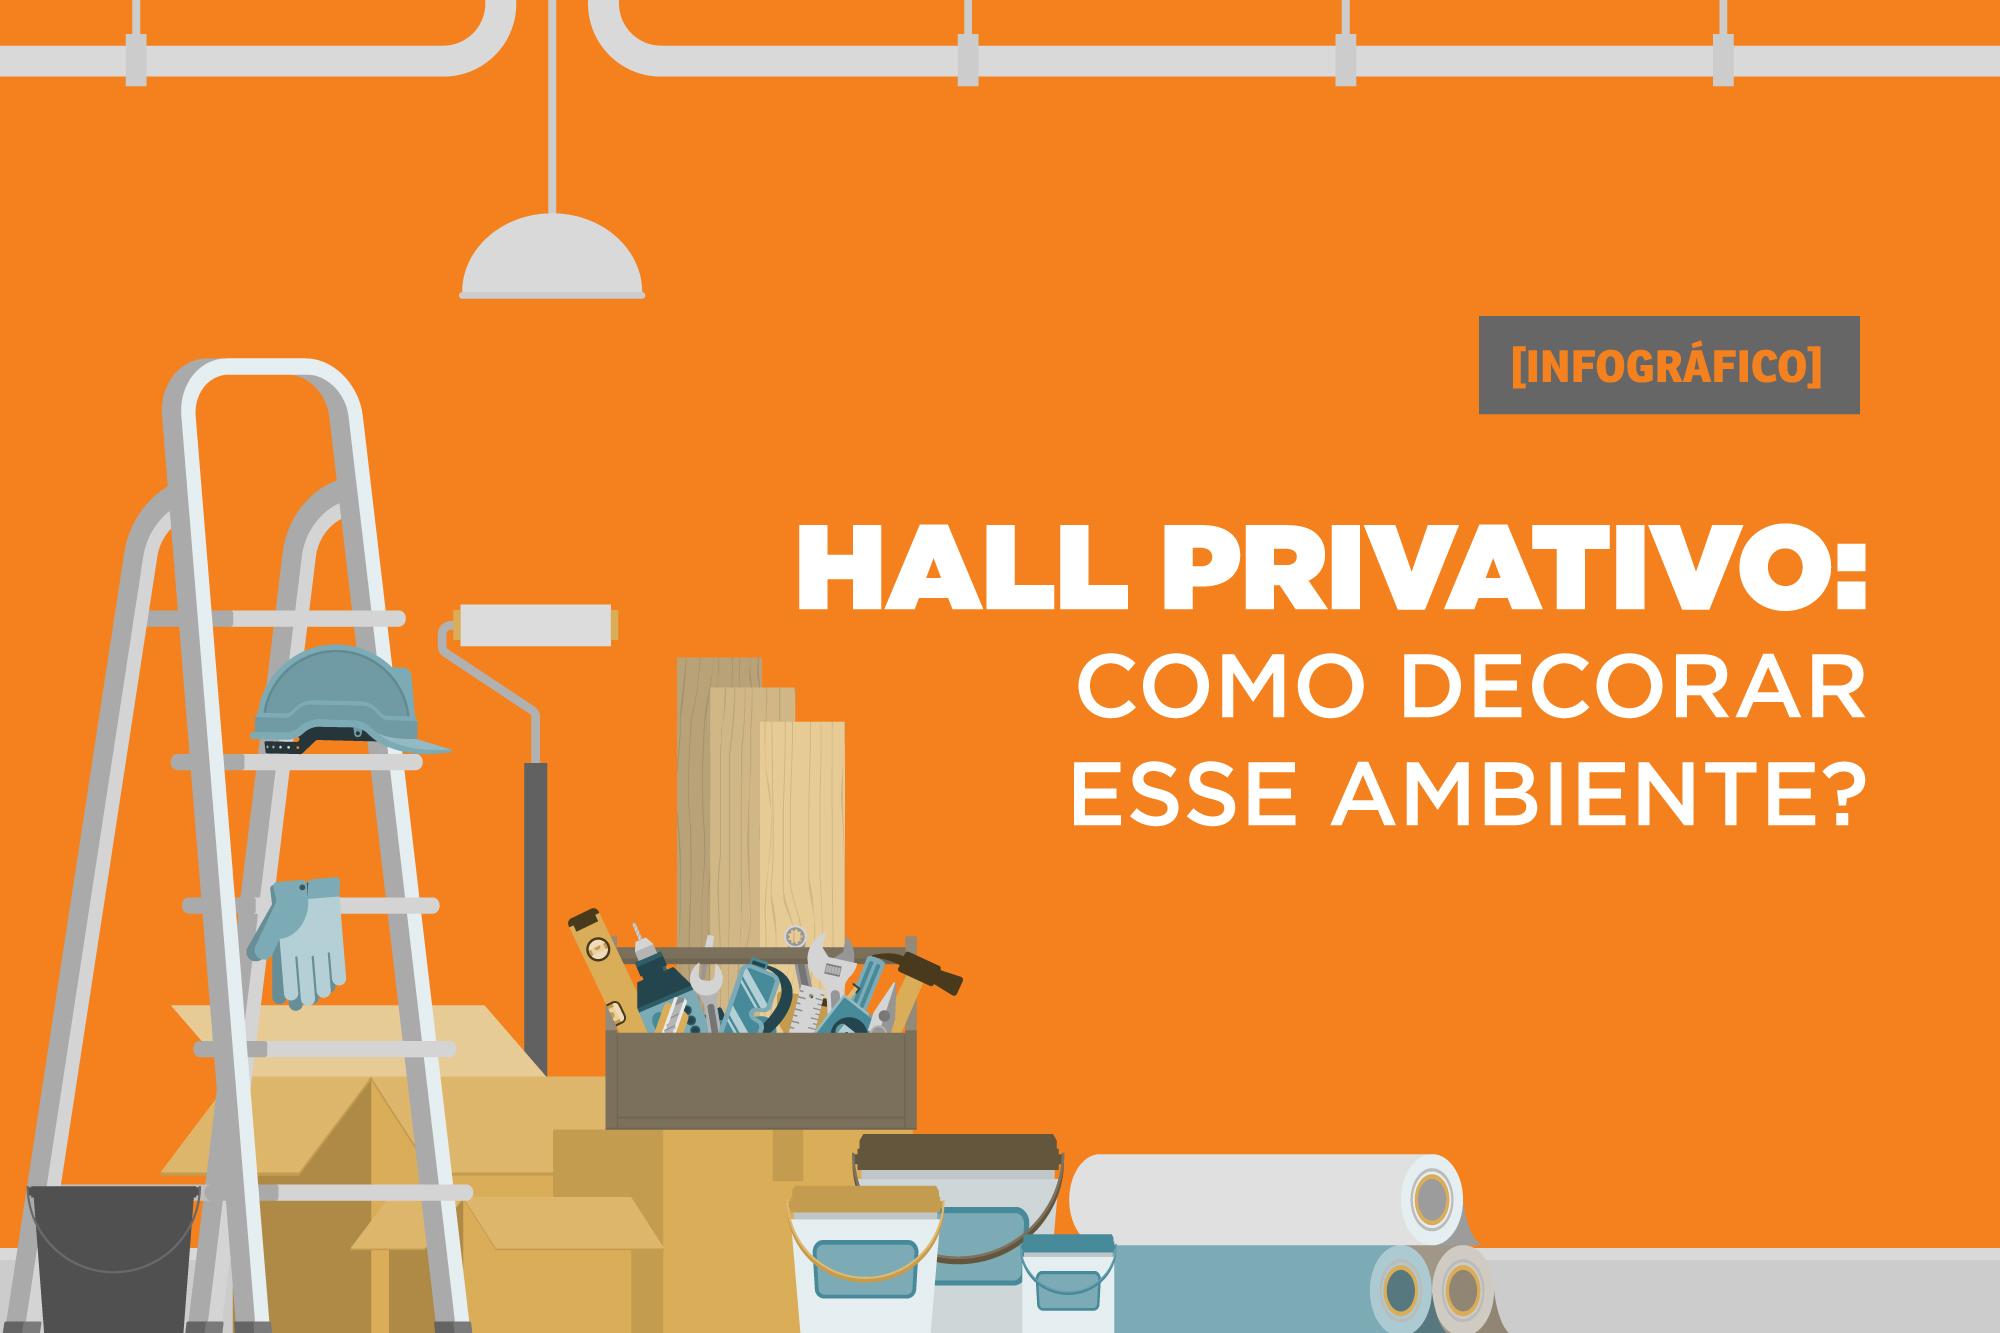 Hall privativo: como decorar esse ambiente? - Finger